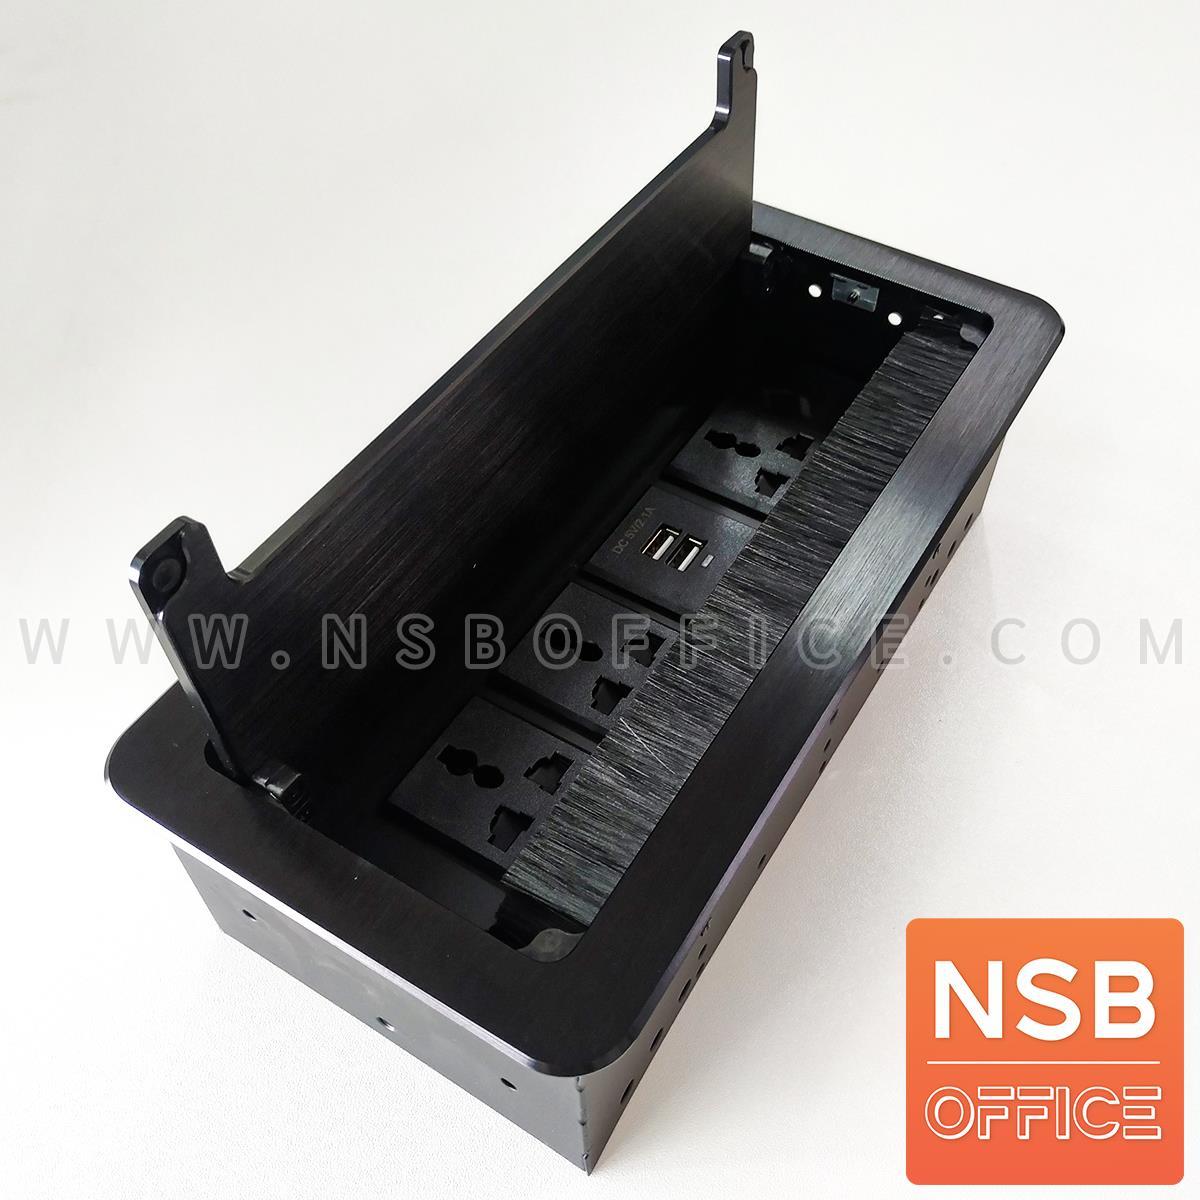 A24A057:ป็อปอัพสี่เหลี่ยม รุ่น Blacksky (แบล็คสกาย) ขนาด 26.5W cm.  ผลิตจากอลูมิเนียมแฮร์ไลน์สีดำ